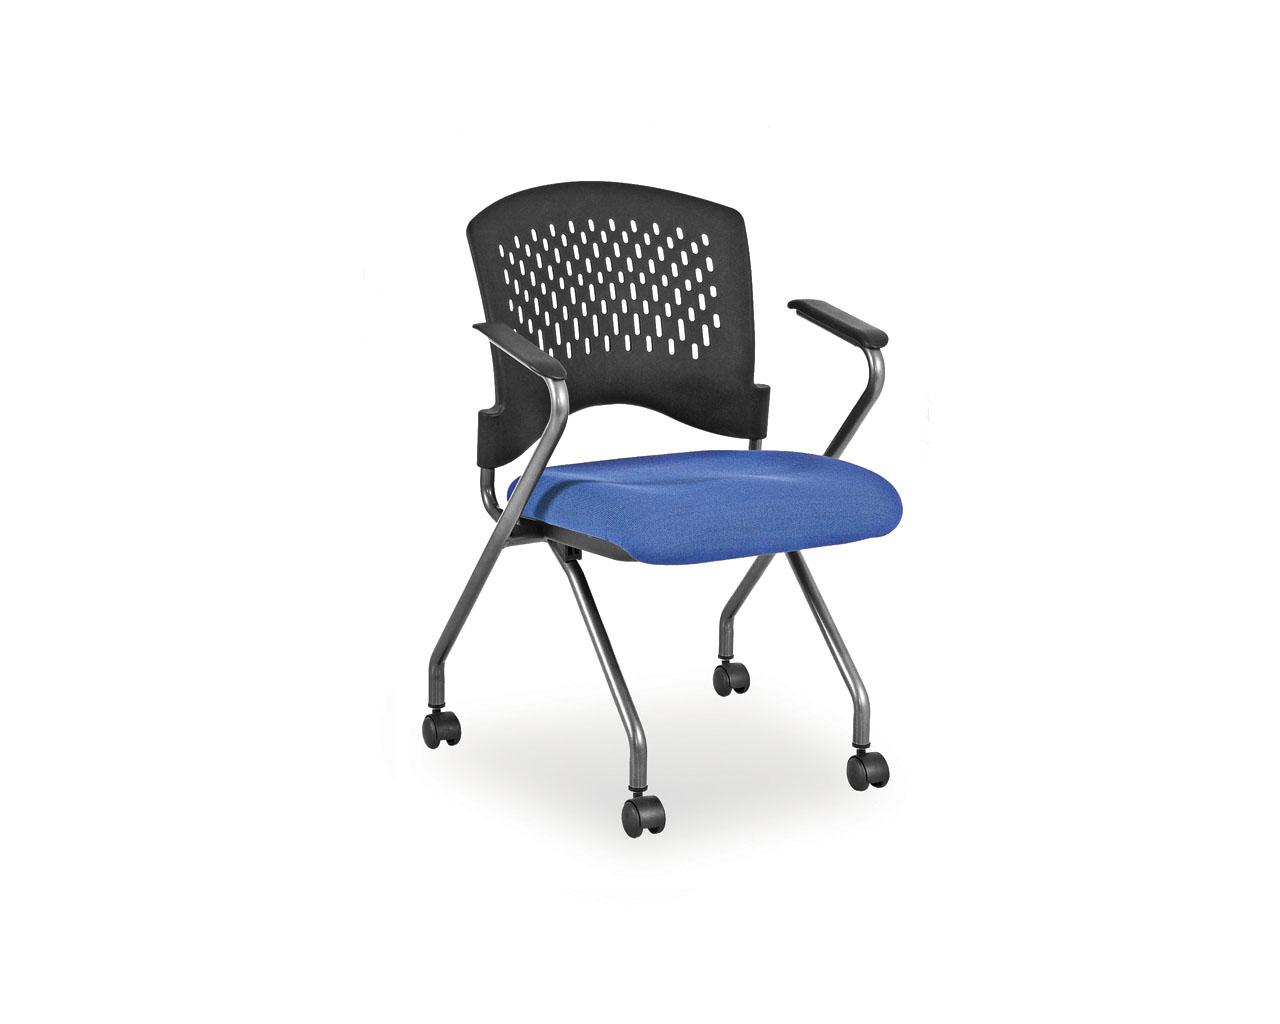 swivel chair victoria bc turquoise velvet nesting chairs edmonton nest bumps charcoal accent